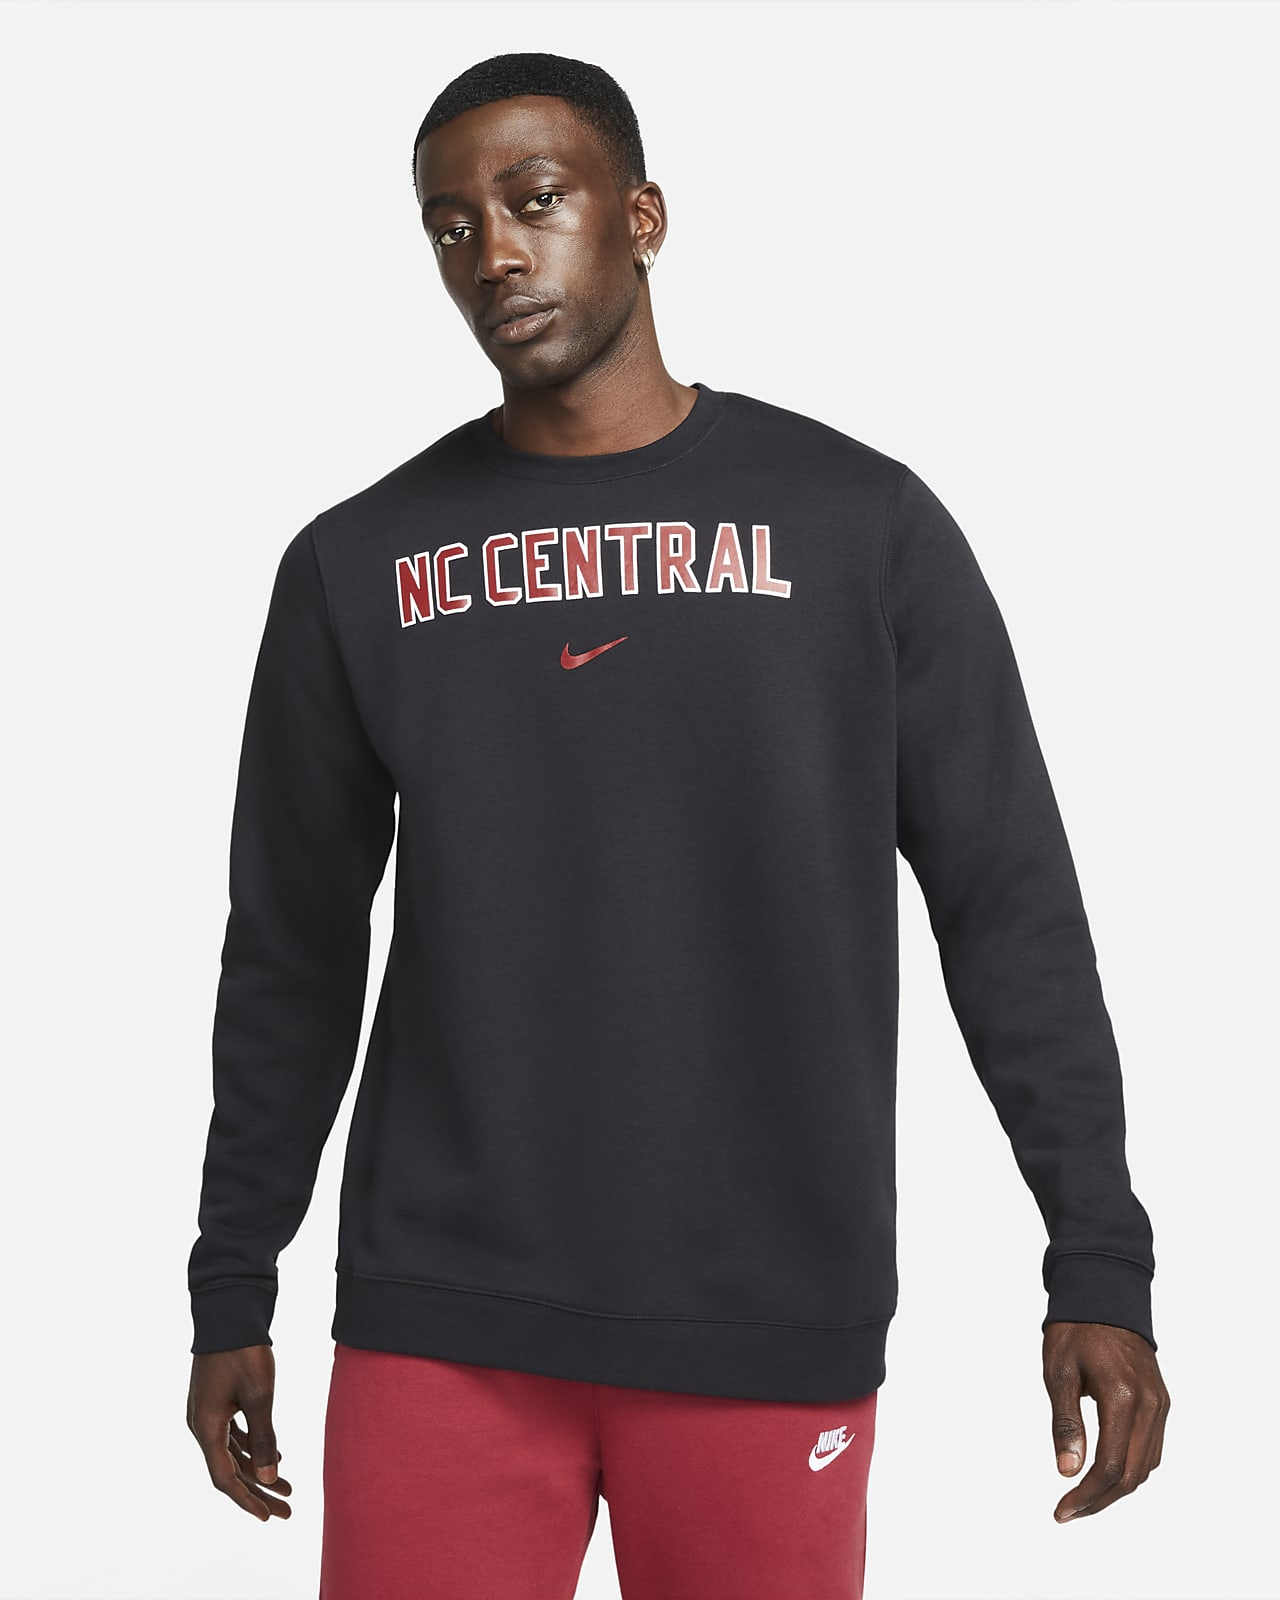 Nike College Club Fleece (North Carolina Central) Crew Sweatshirt